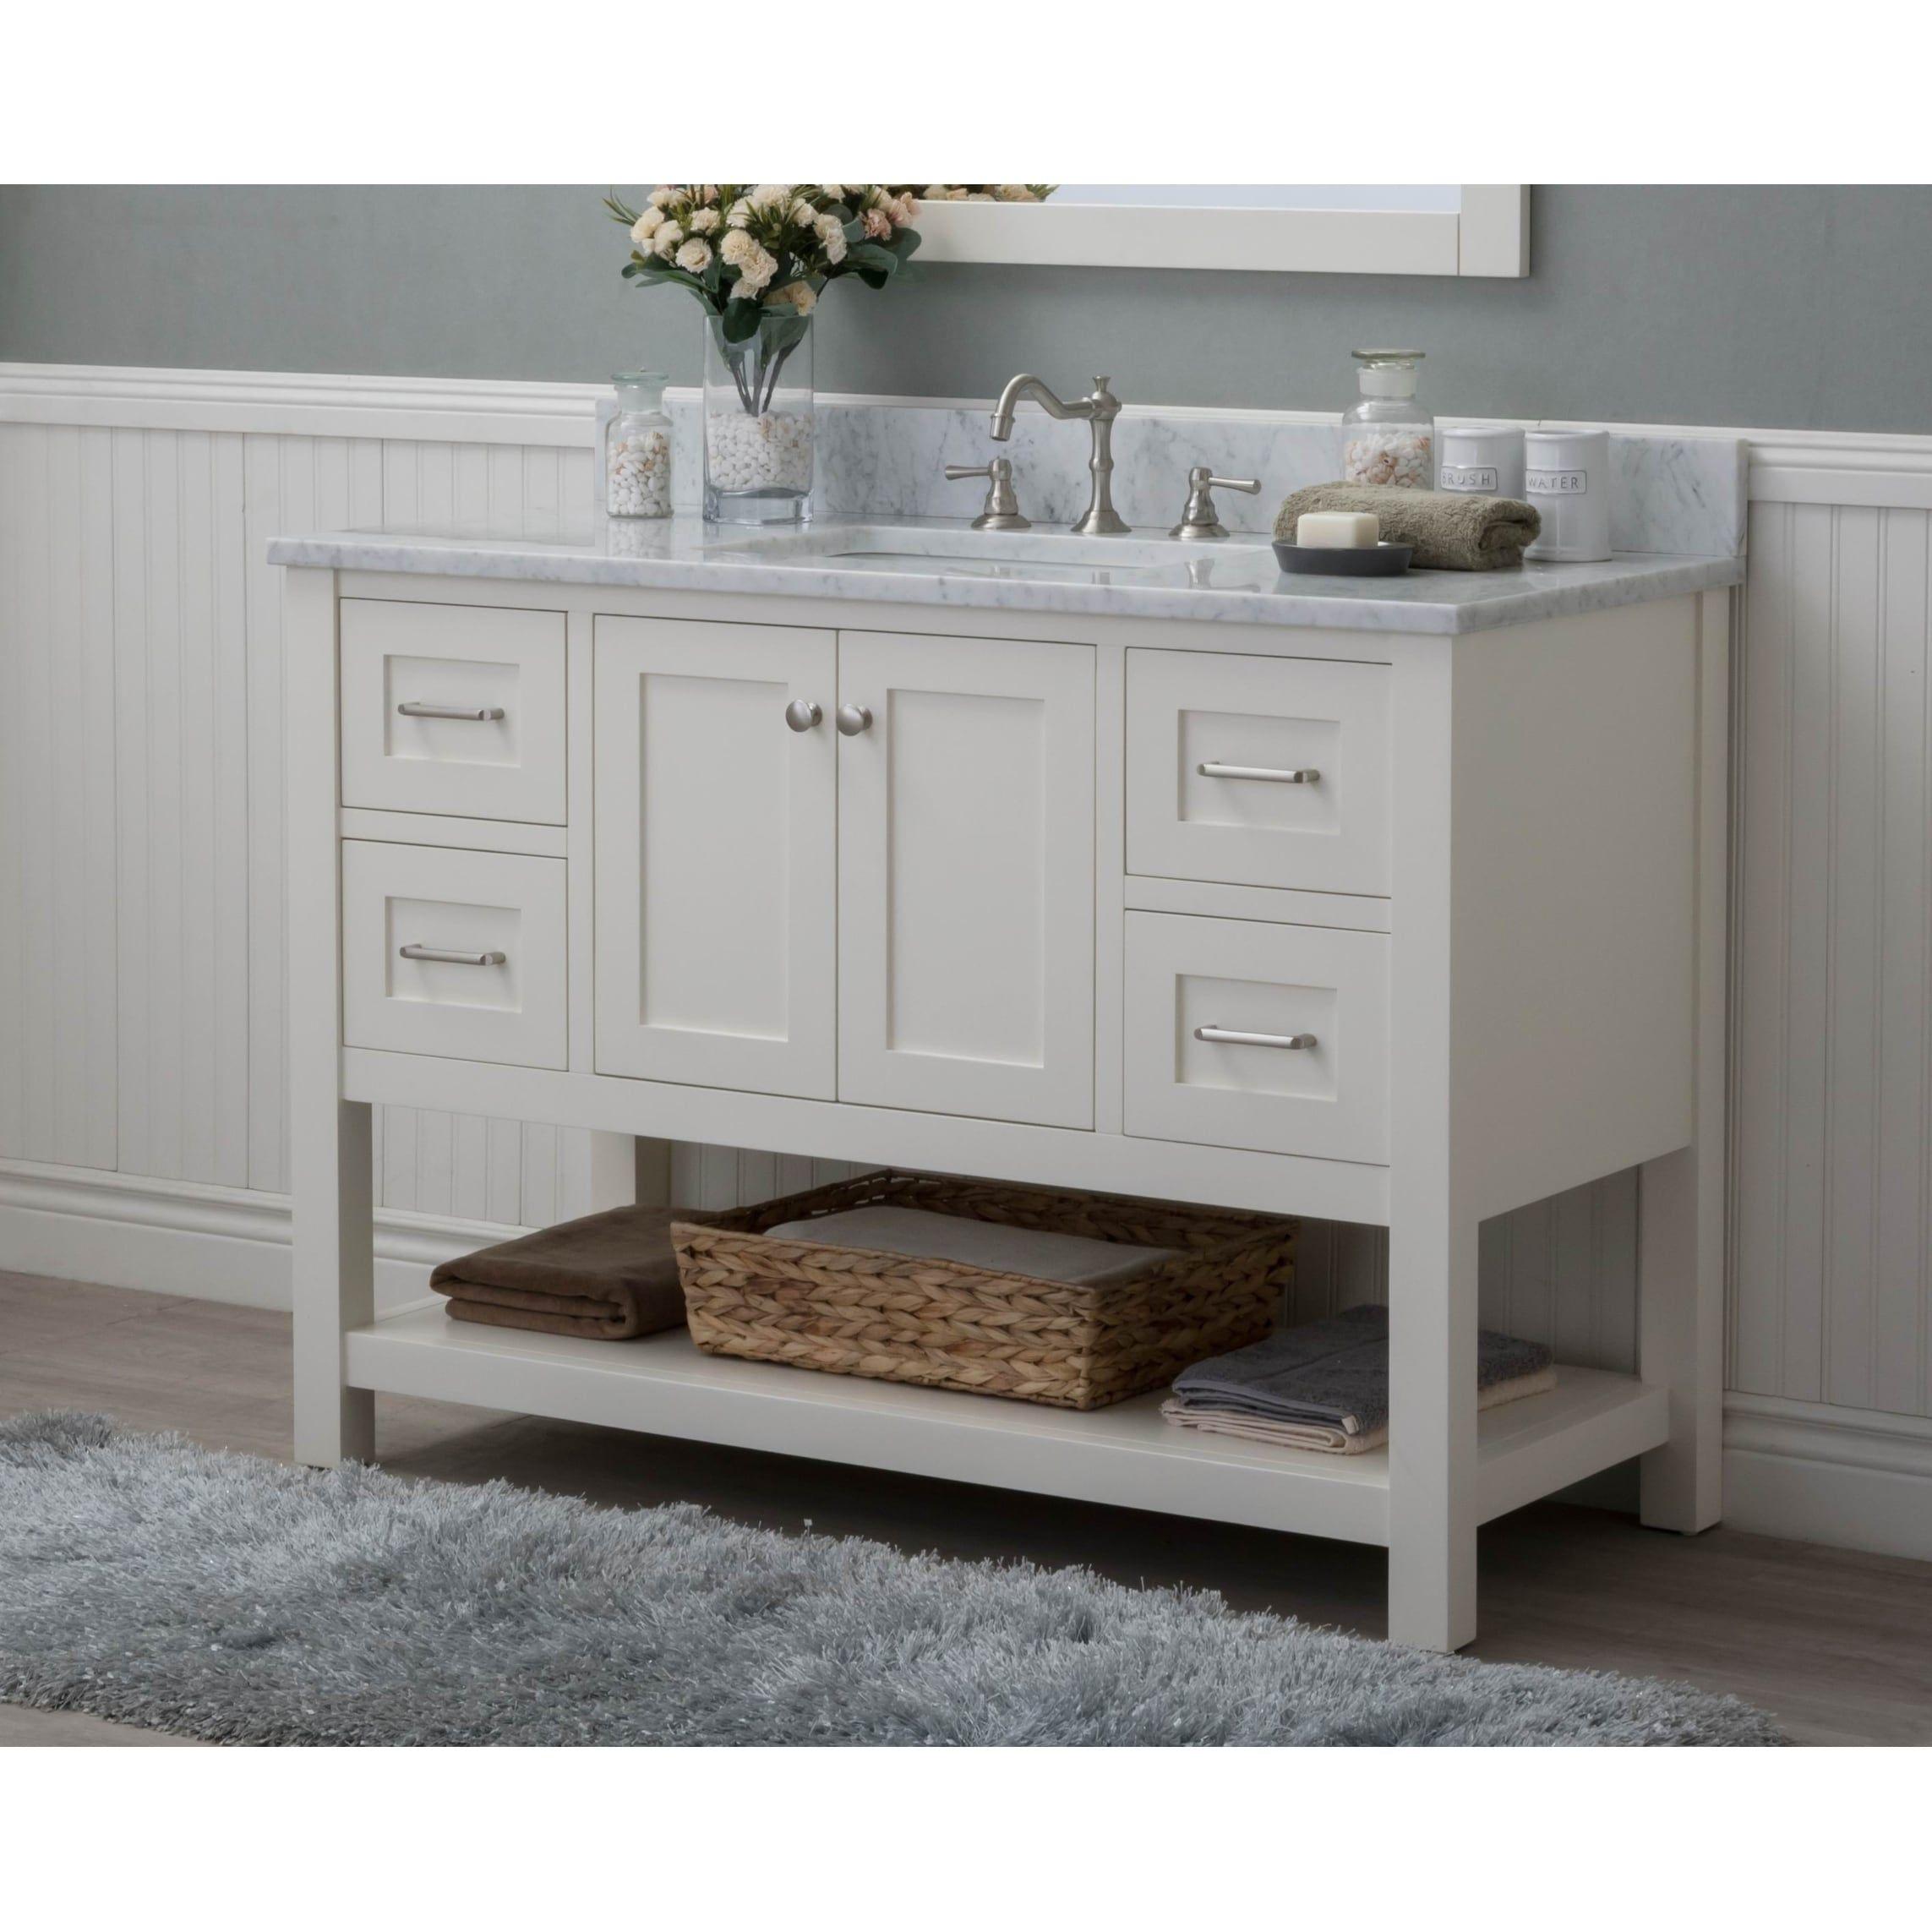 Home elements vl white carrara marble inch cream white